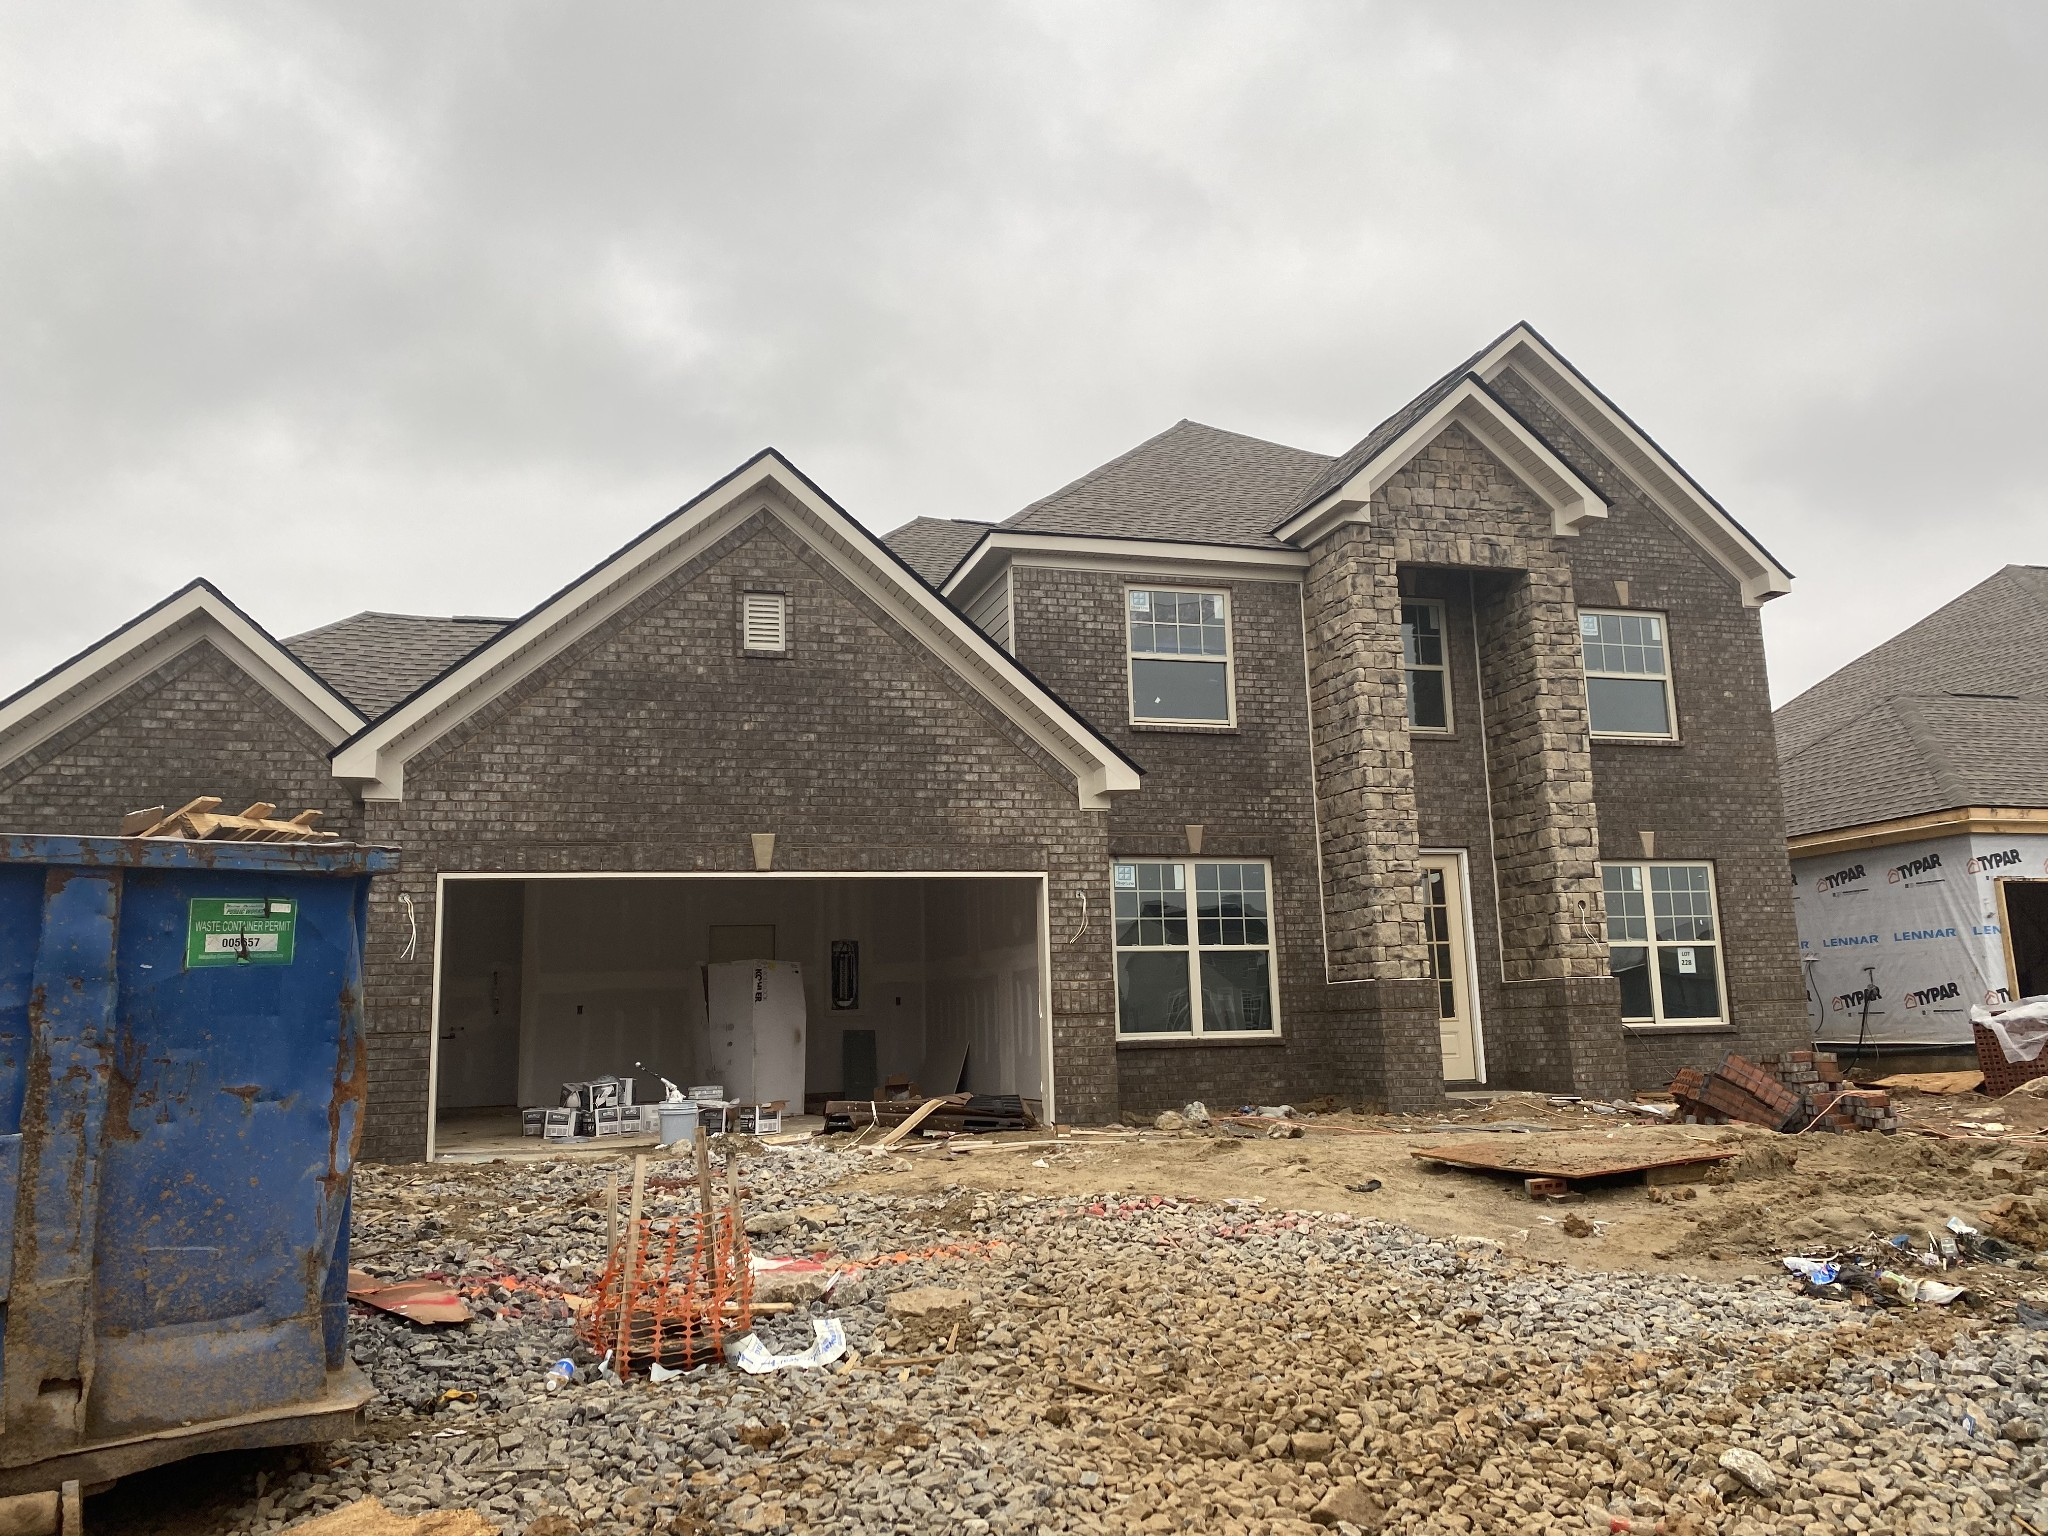 4718 Lapis Lane- Lot 228o, Murfreesboro, TN 37128 - Murfreesboro, TN real estate listing